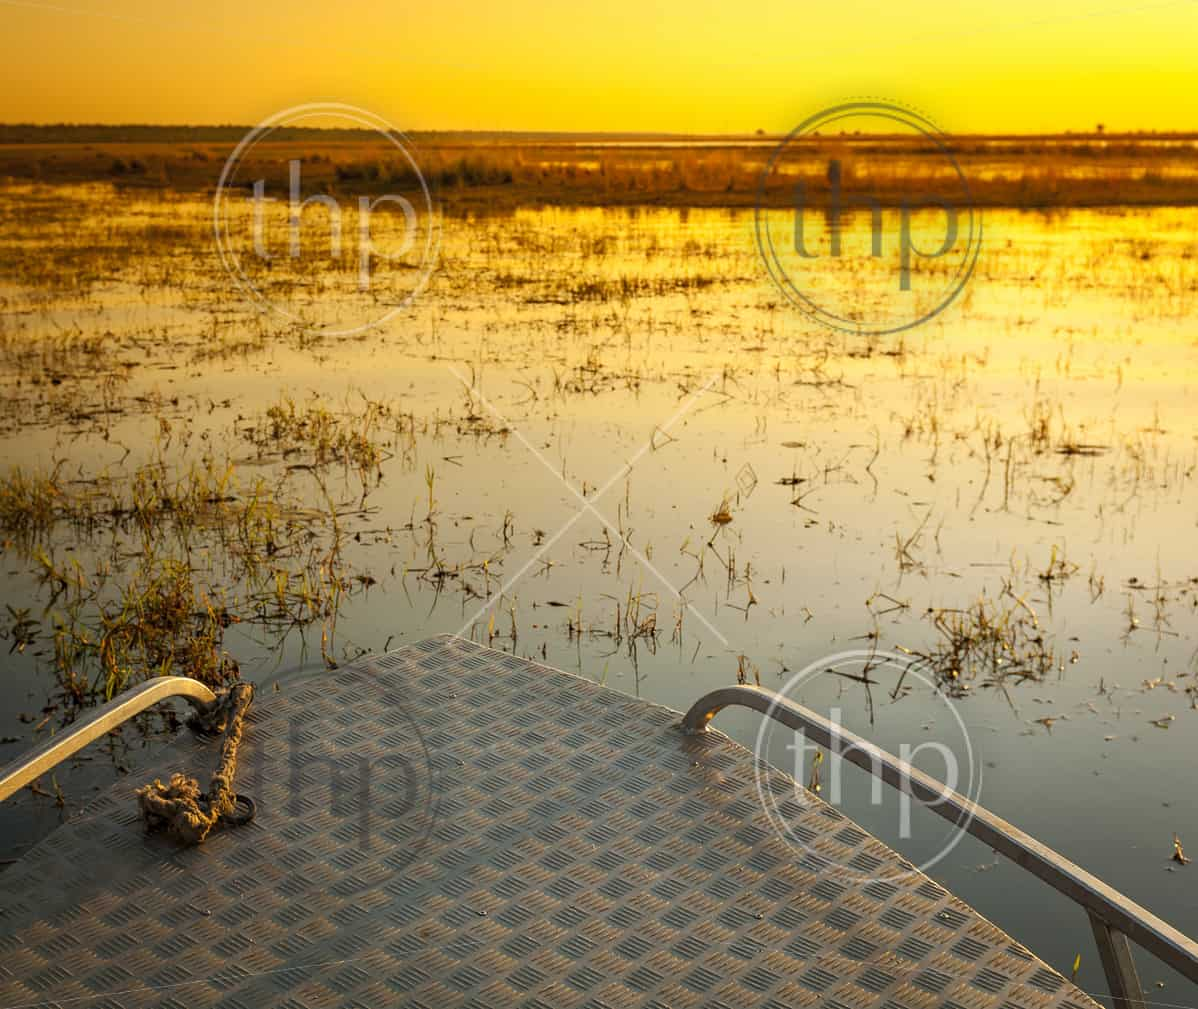 Sunset cruise on the Chobe River, Botswana, Africa